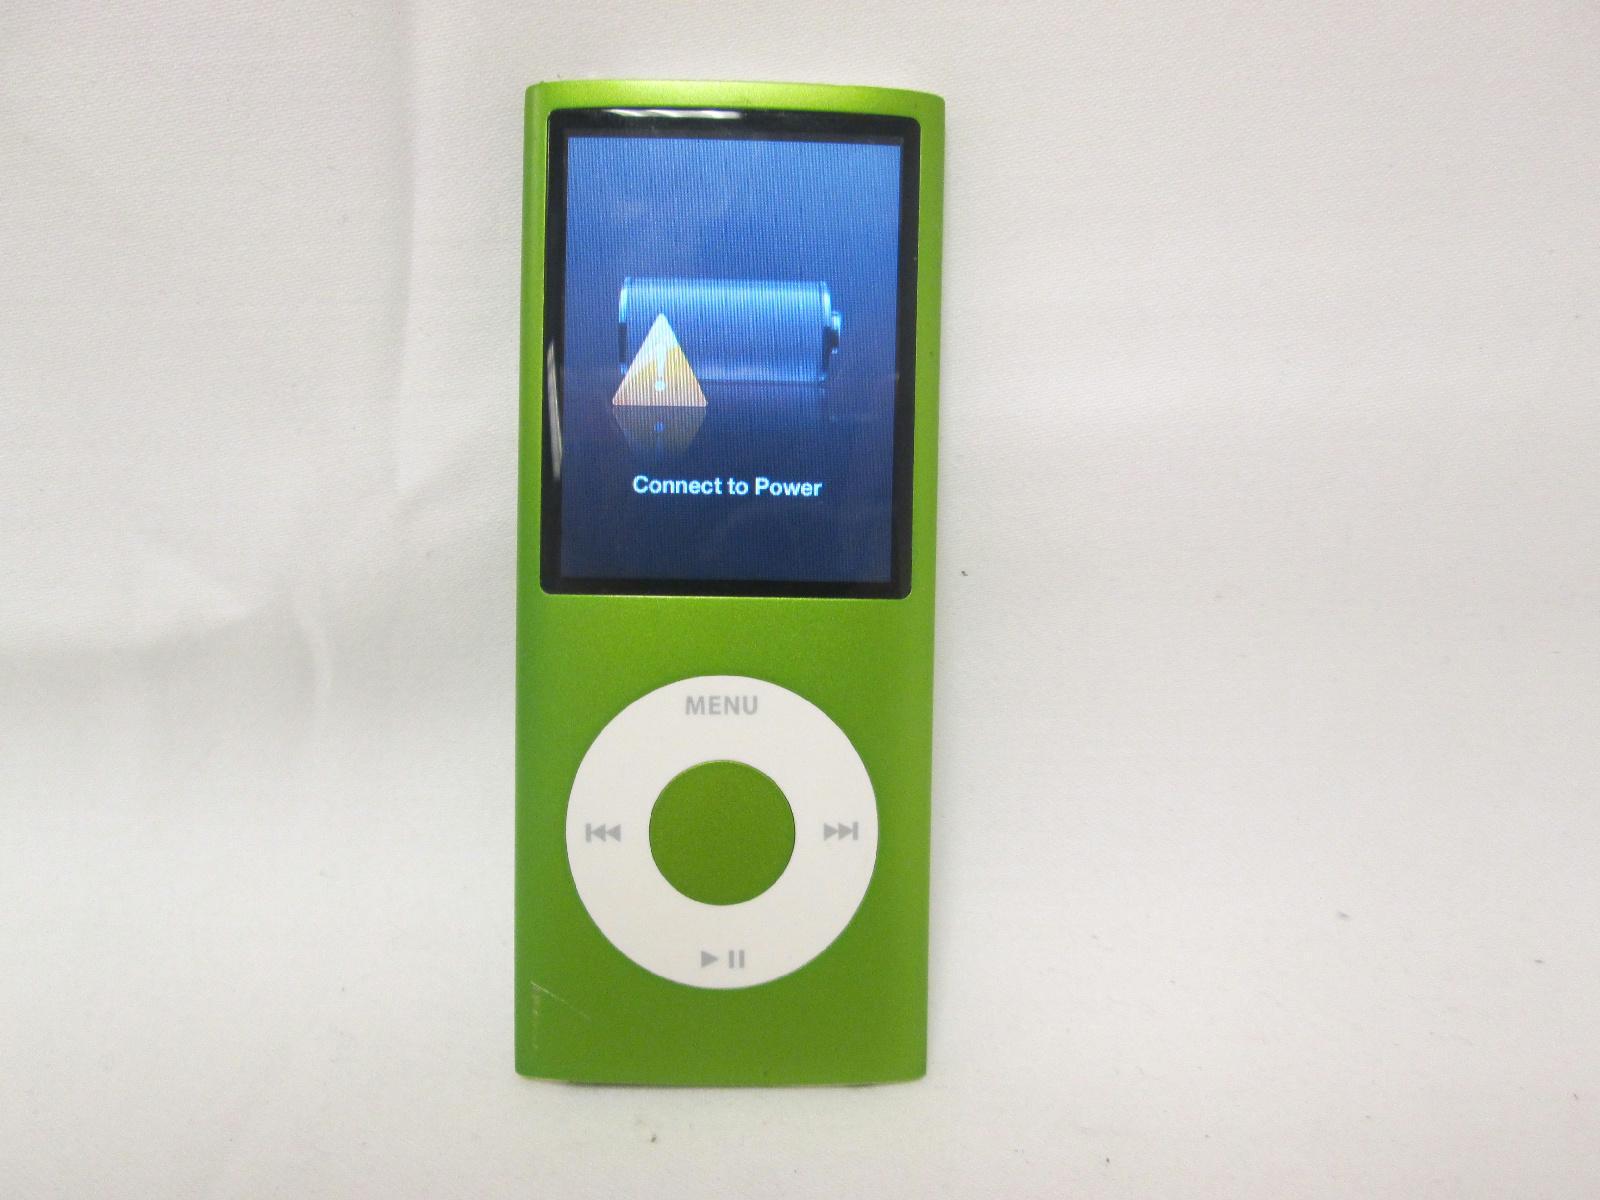 apple ipod nano mp3 player 8 gb green 4th generation. Black Bedroom Furniture Sets. Home Design Ideas